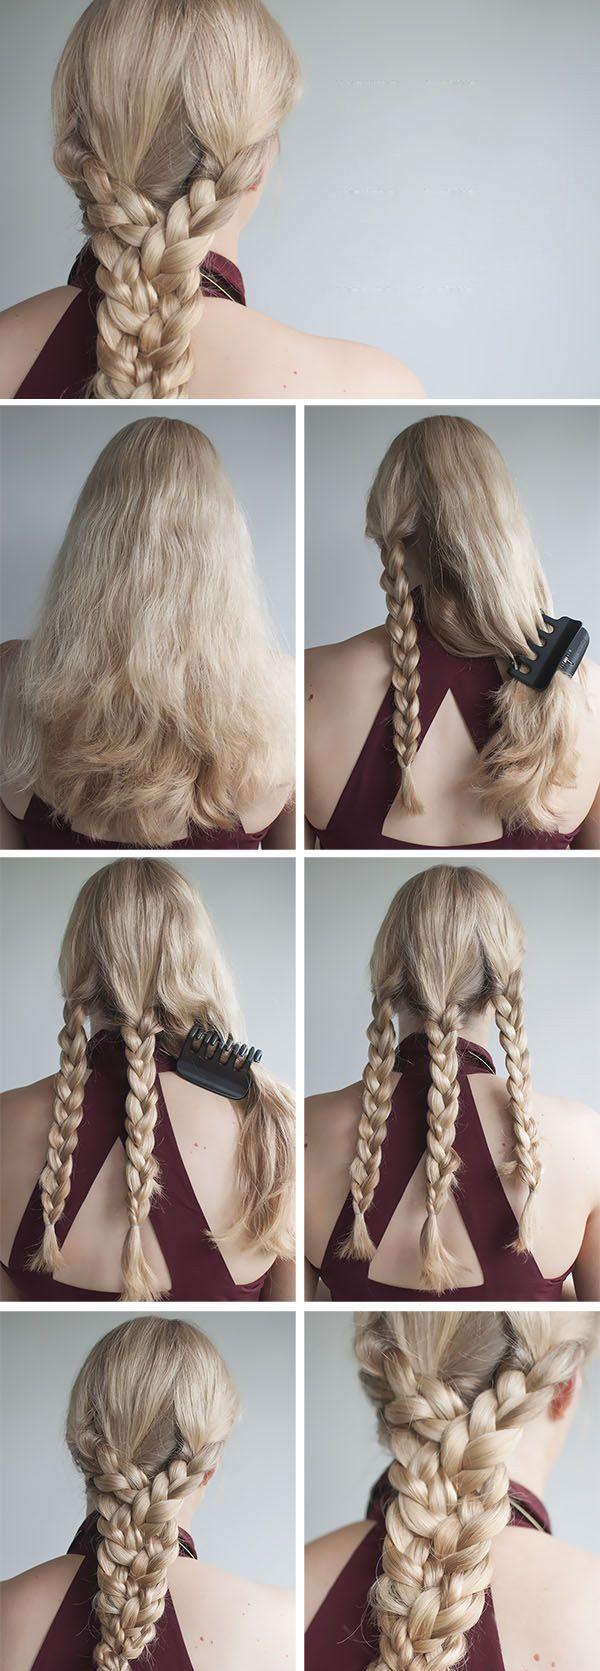 Awe inspiring pinterest the world39s catalog of ideas updo hairstyles - Scandinavian Hairstyle